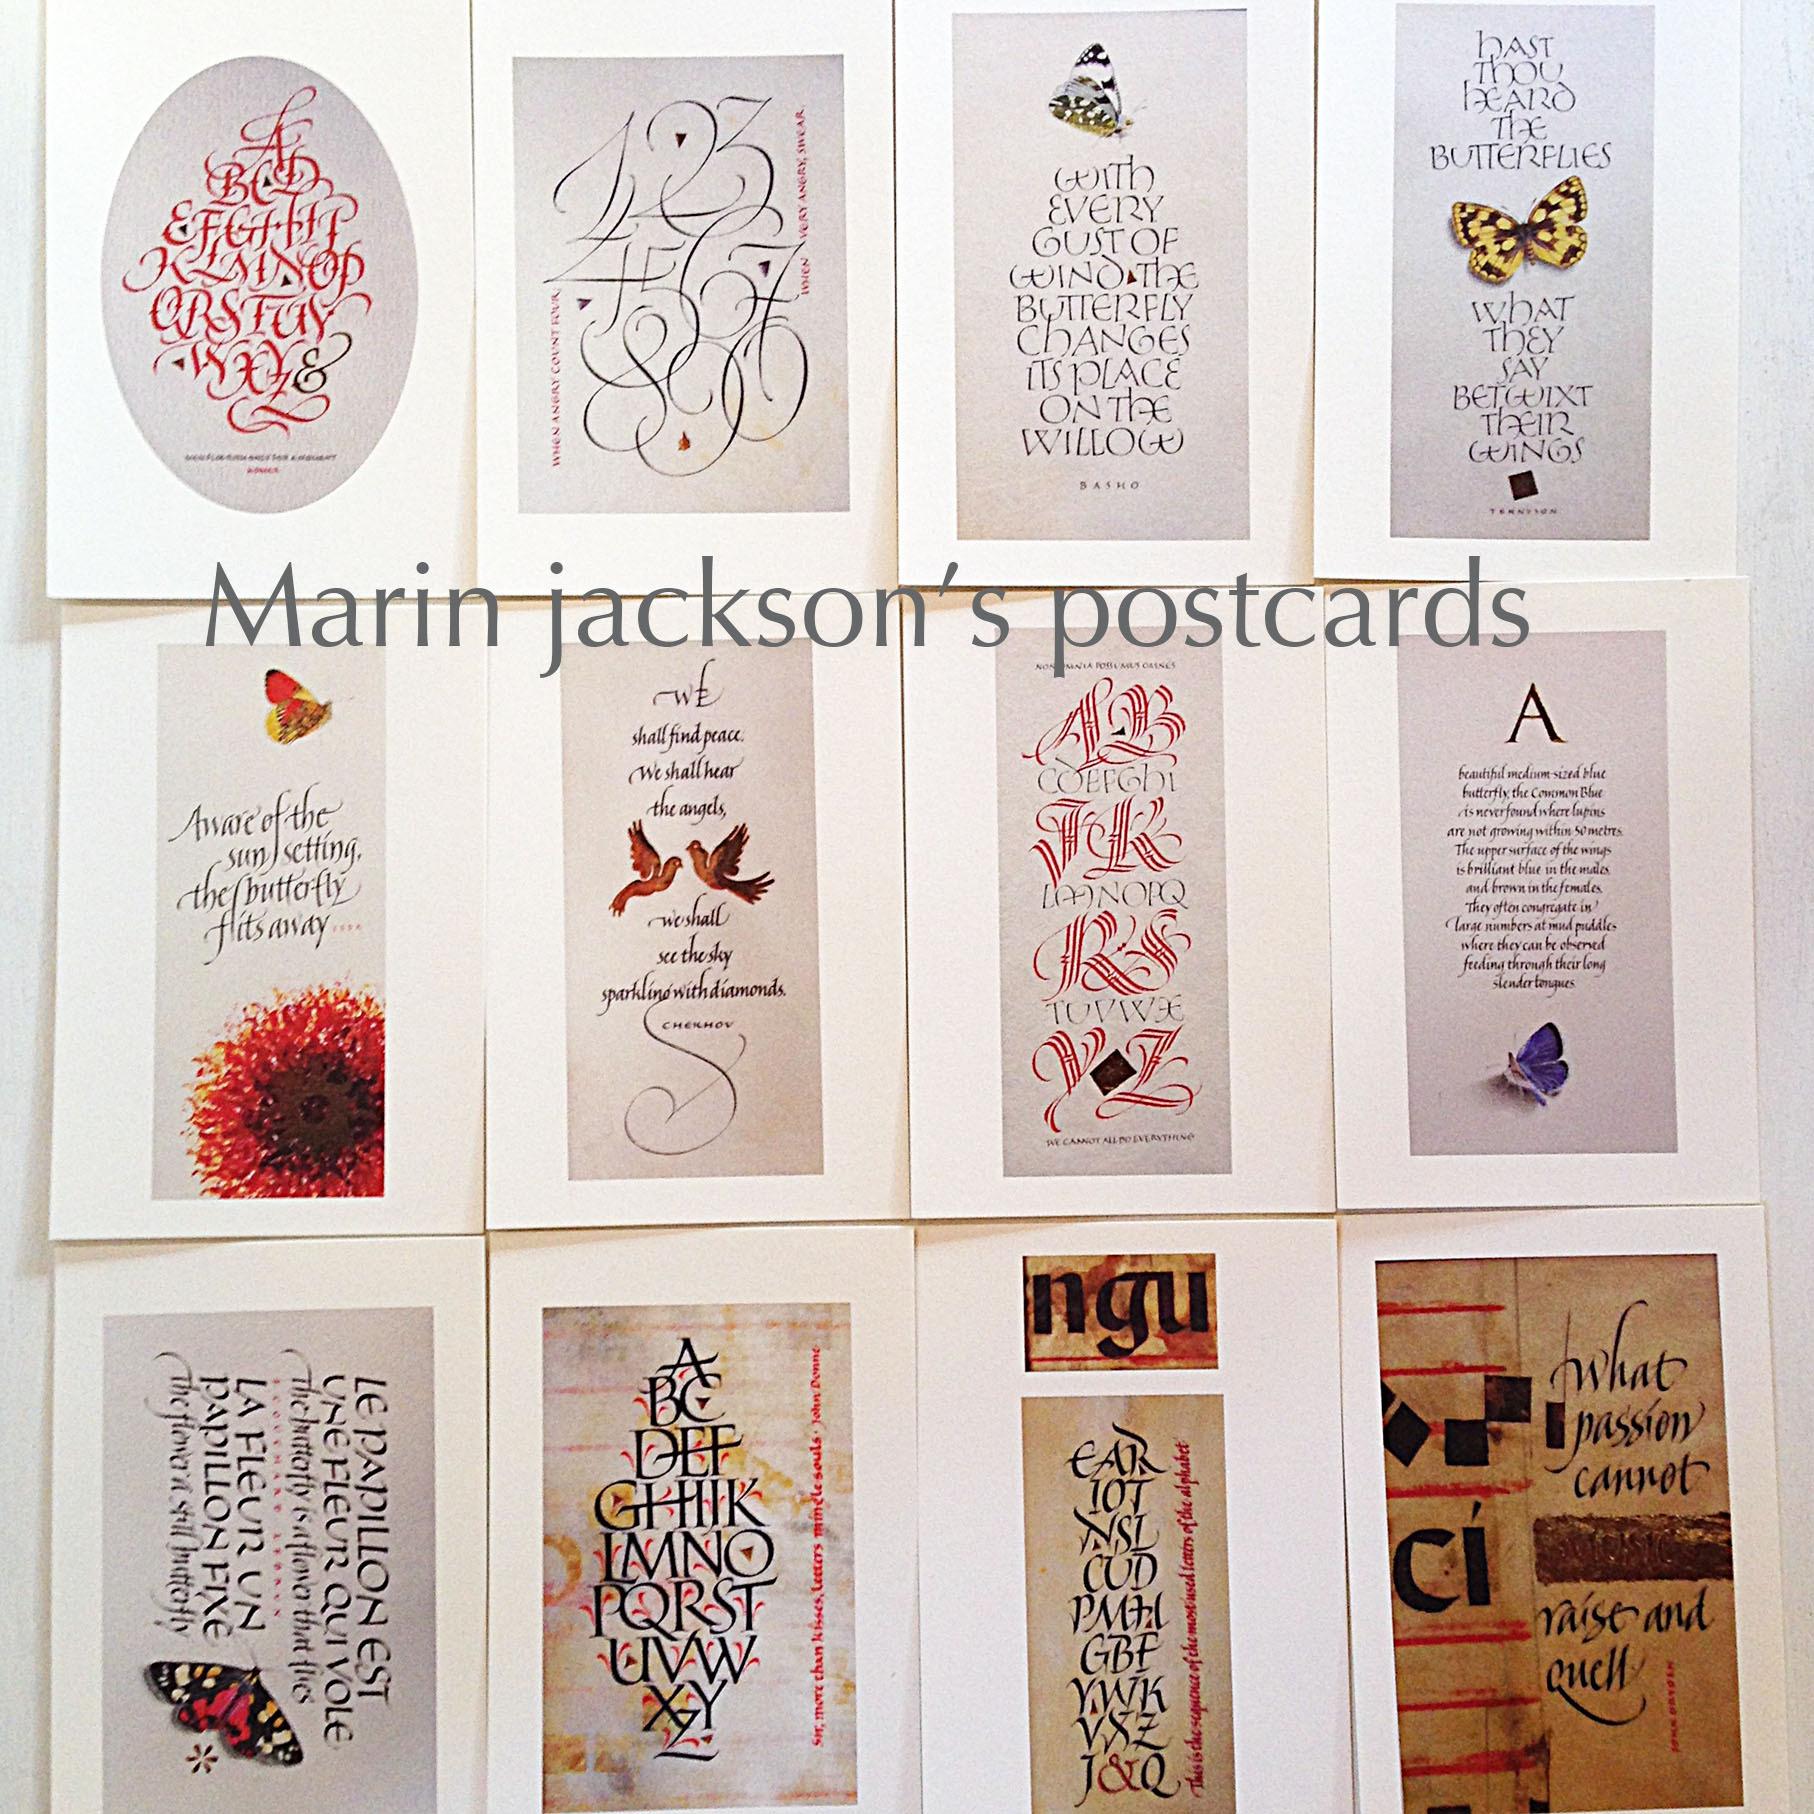 Martin Jackson's postcards(ポストカード)